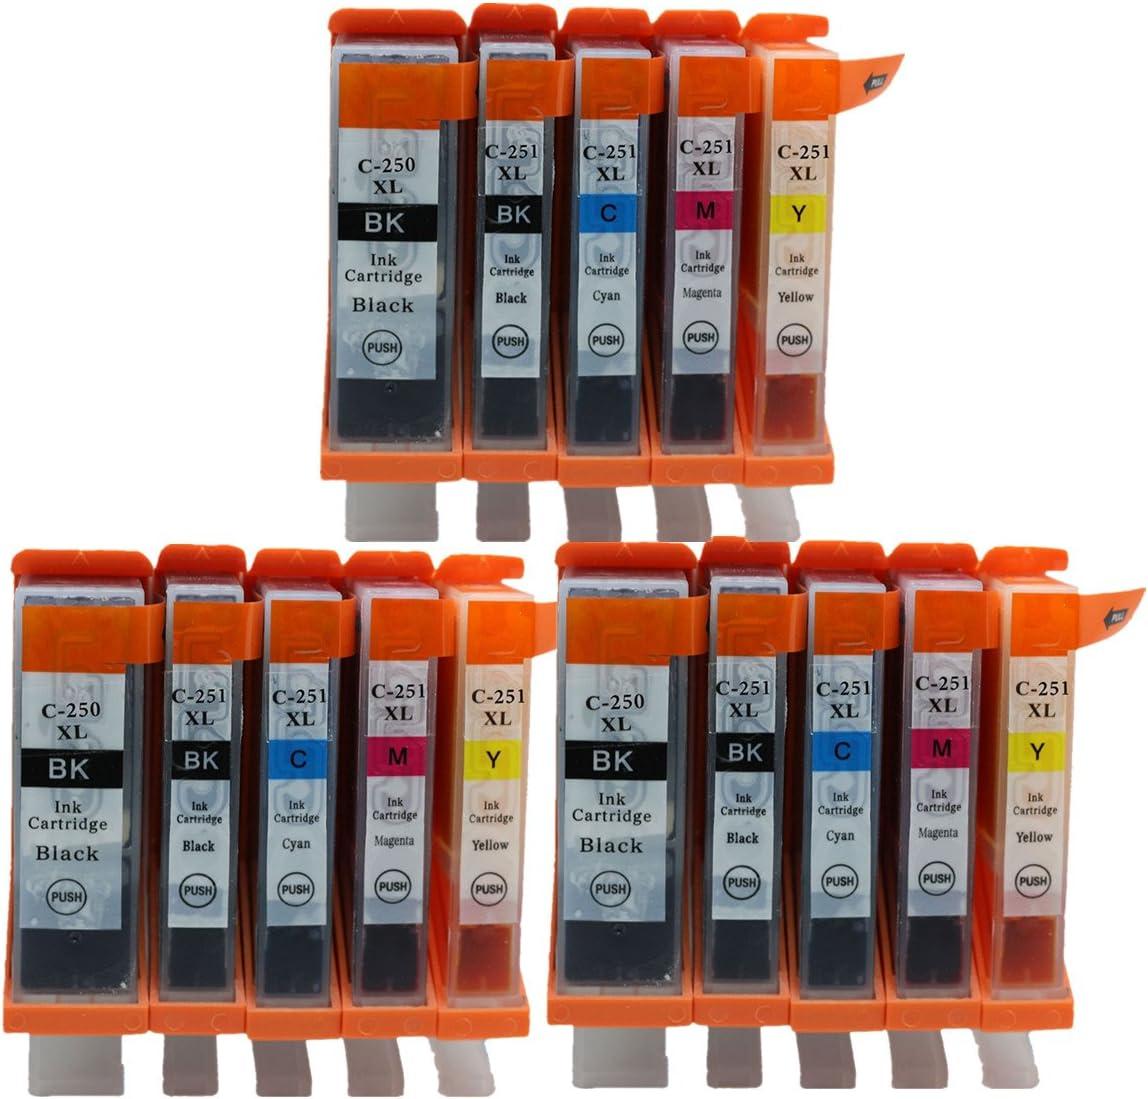 PGI-250 XL PGI250 PGI 250 PGI-250XL CLI-251XL Ink Cartridges Compatible for Canon PIXMA MX922 IP7220 IP8720 IX6820 MG5420 MG5422 MG5520 MG5522 MG5620 MG6320 MG6420 Inkjet Printer